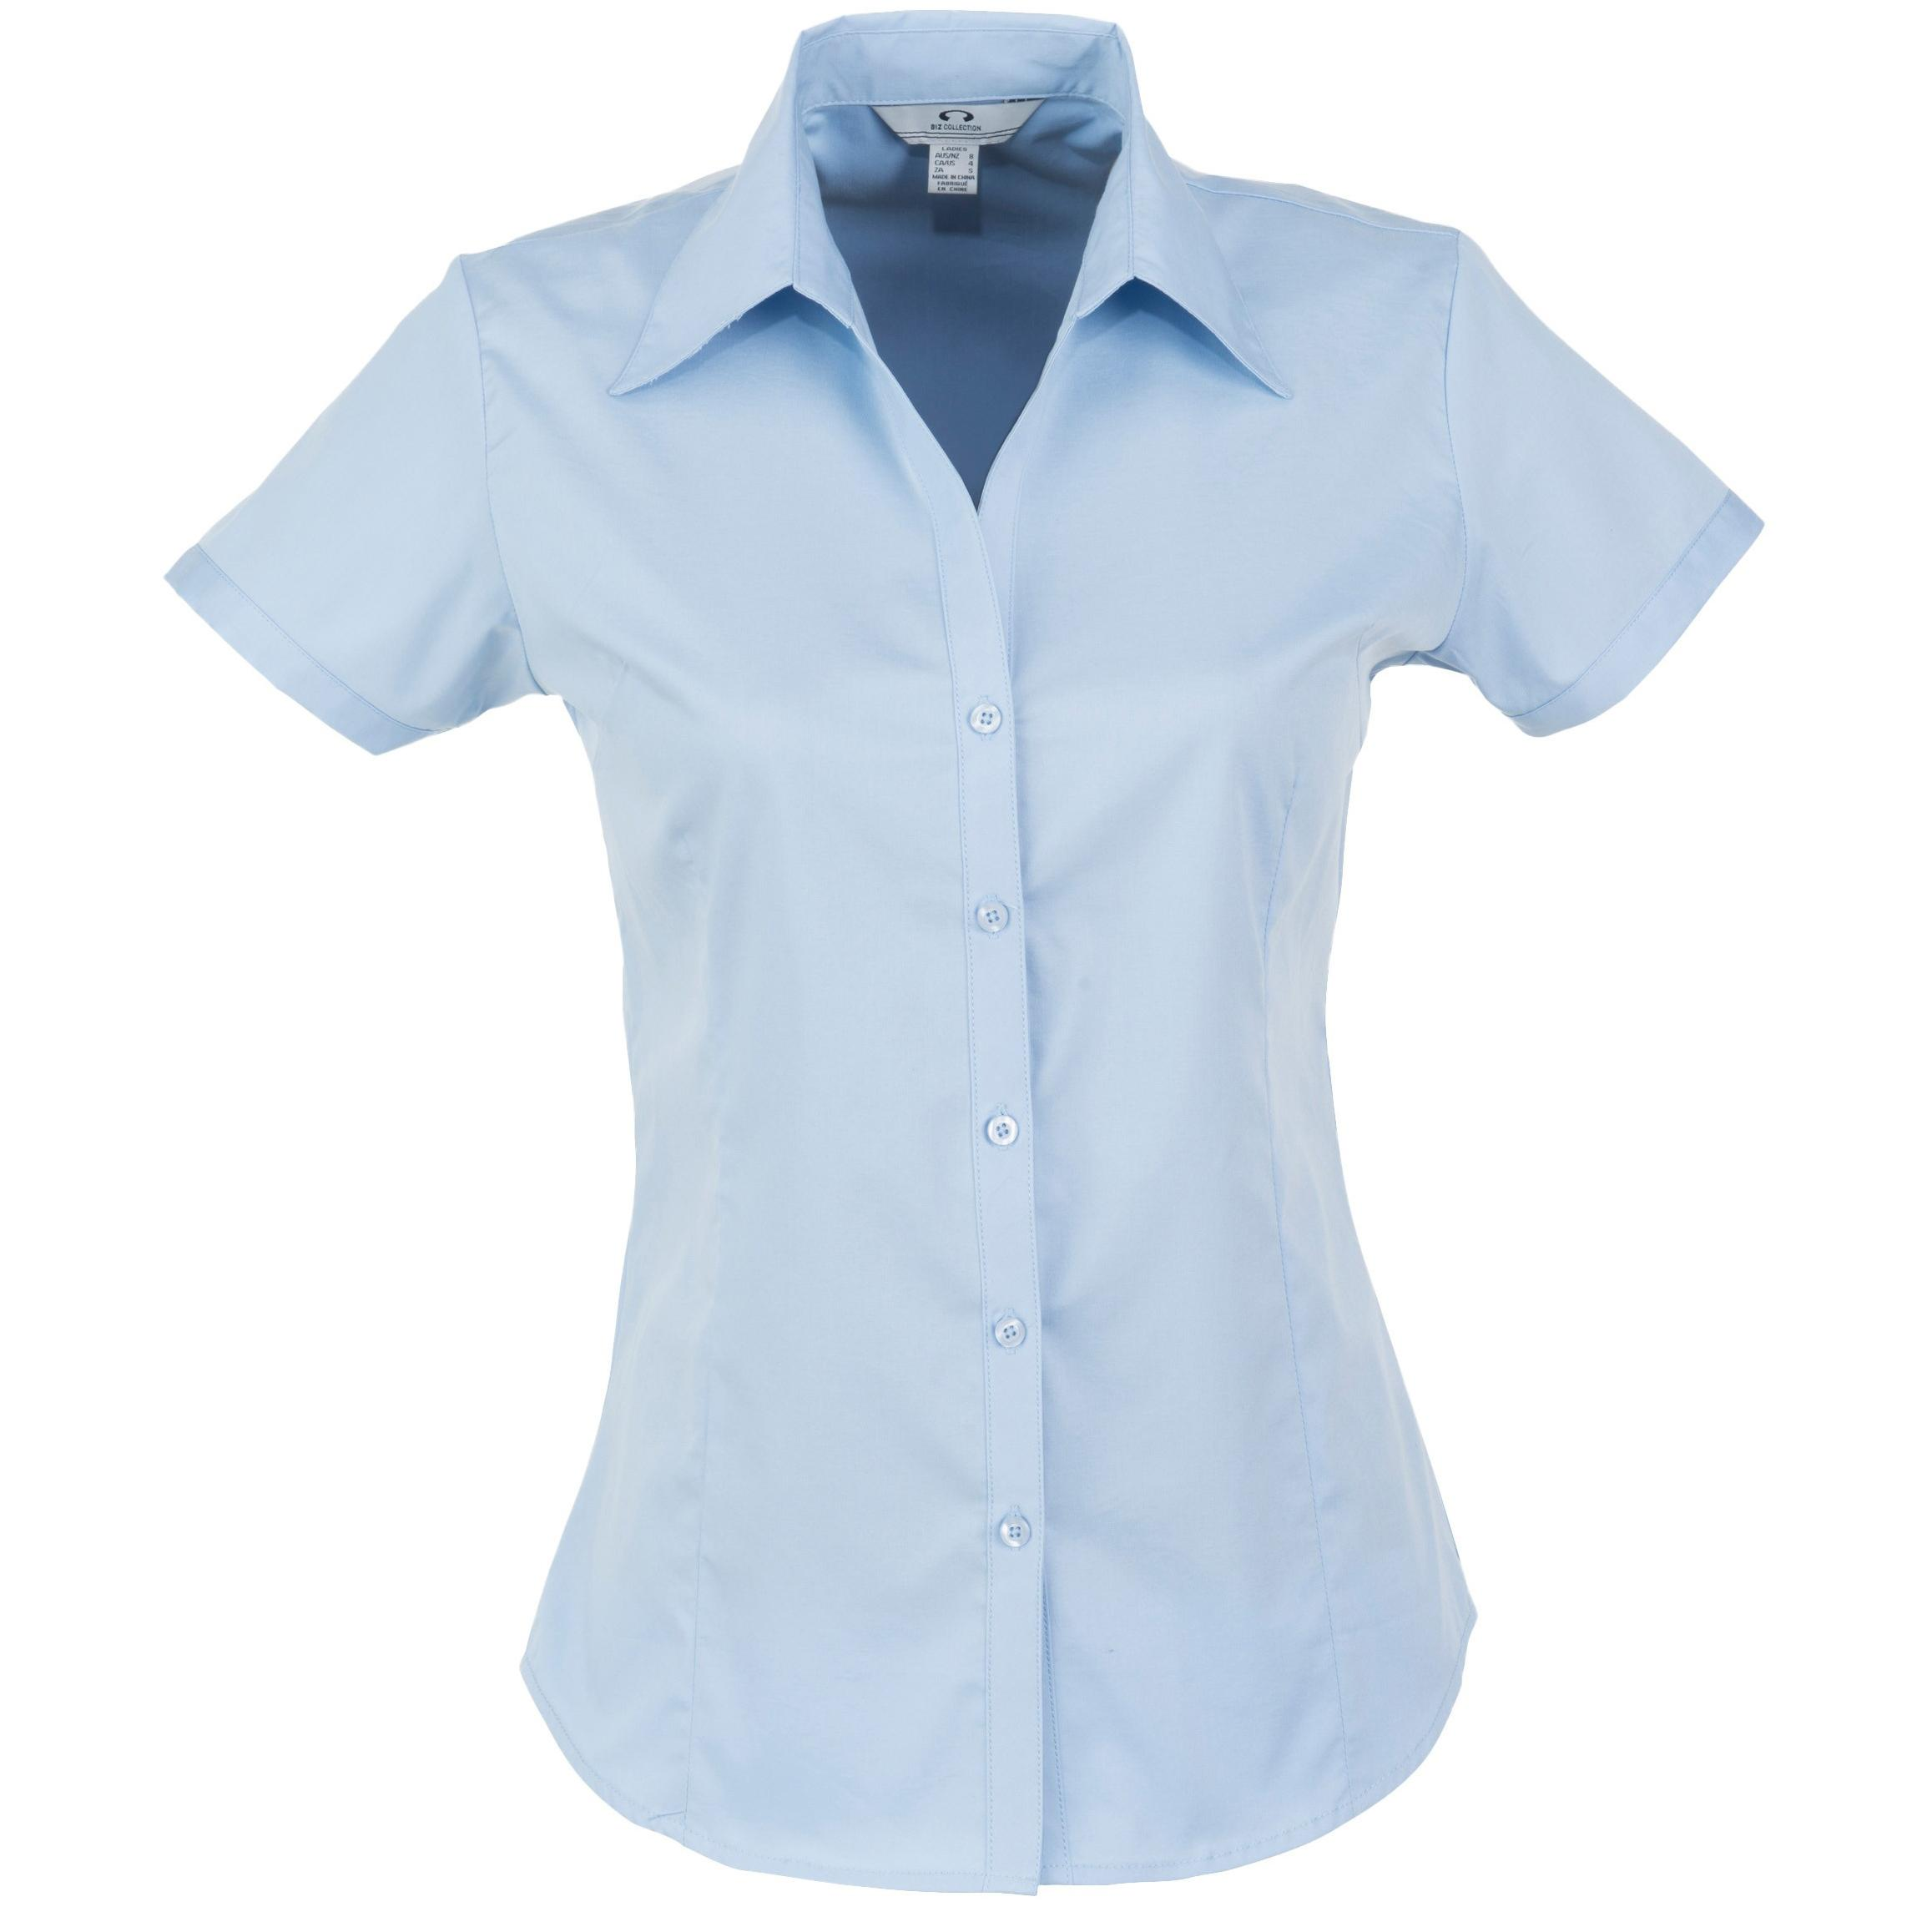 Ladies Short Sleeve Metro Shirt - Light Blue Only